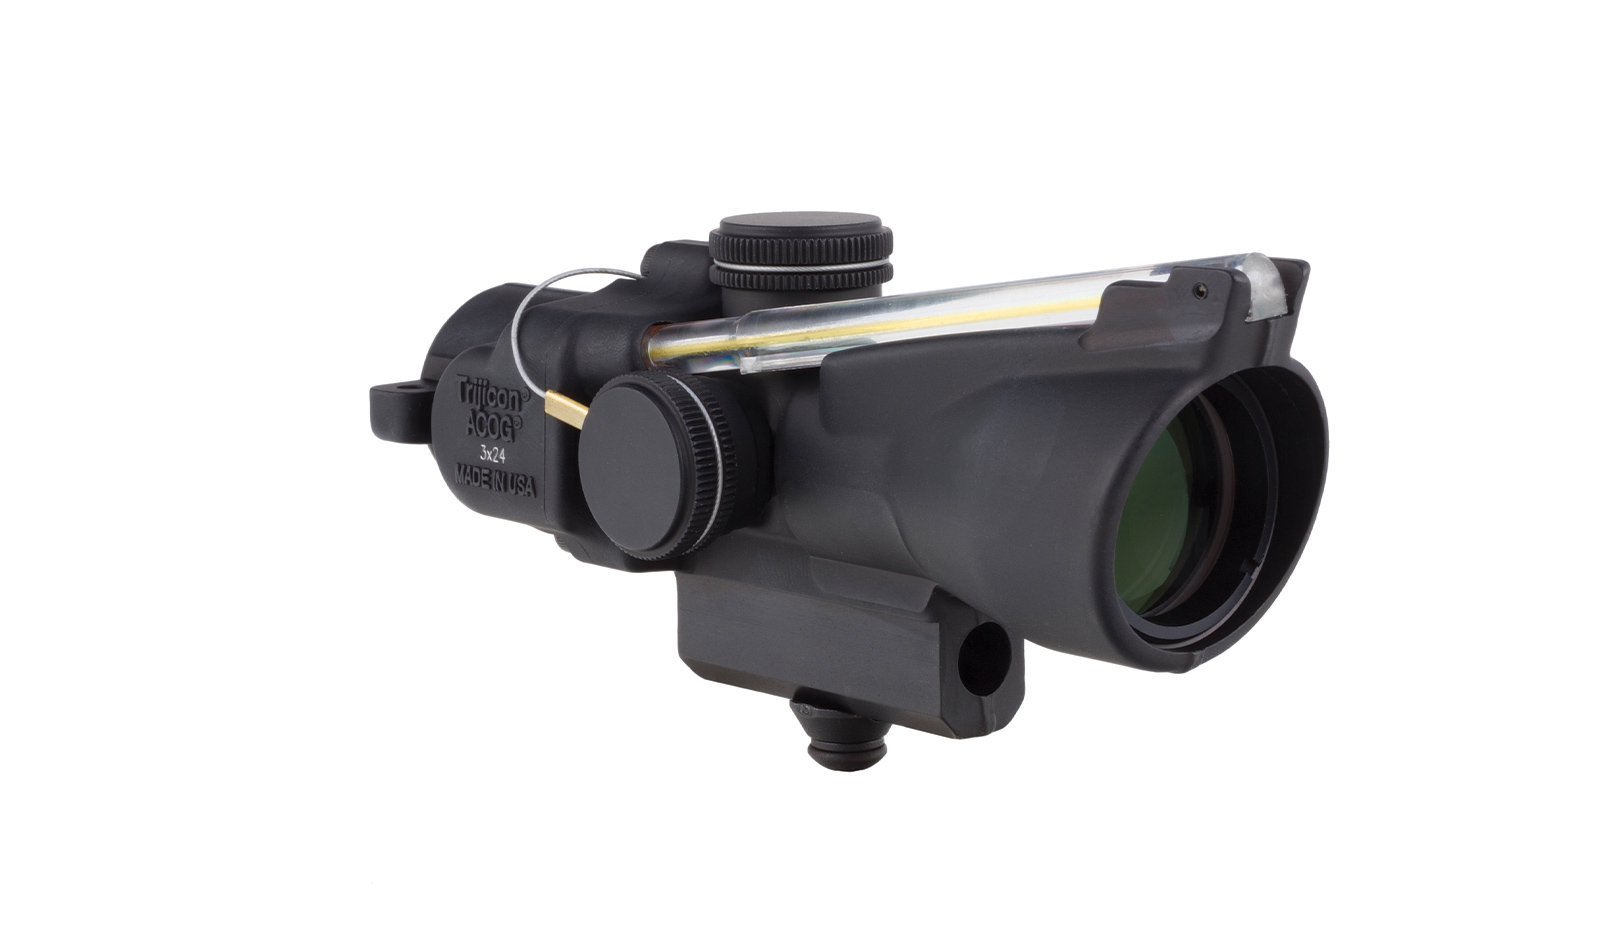 TA50-C-400224 angle 7